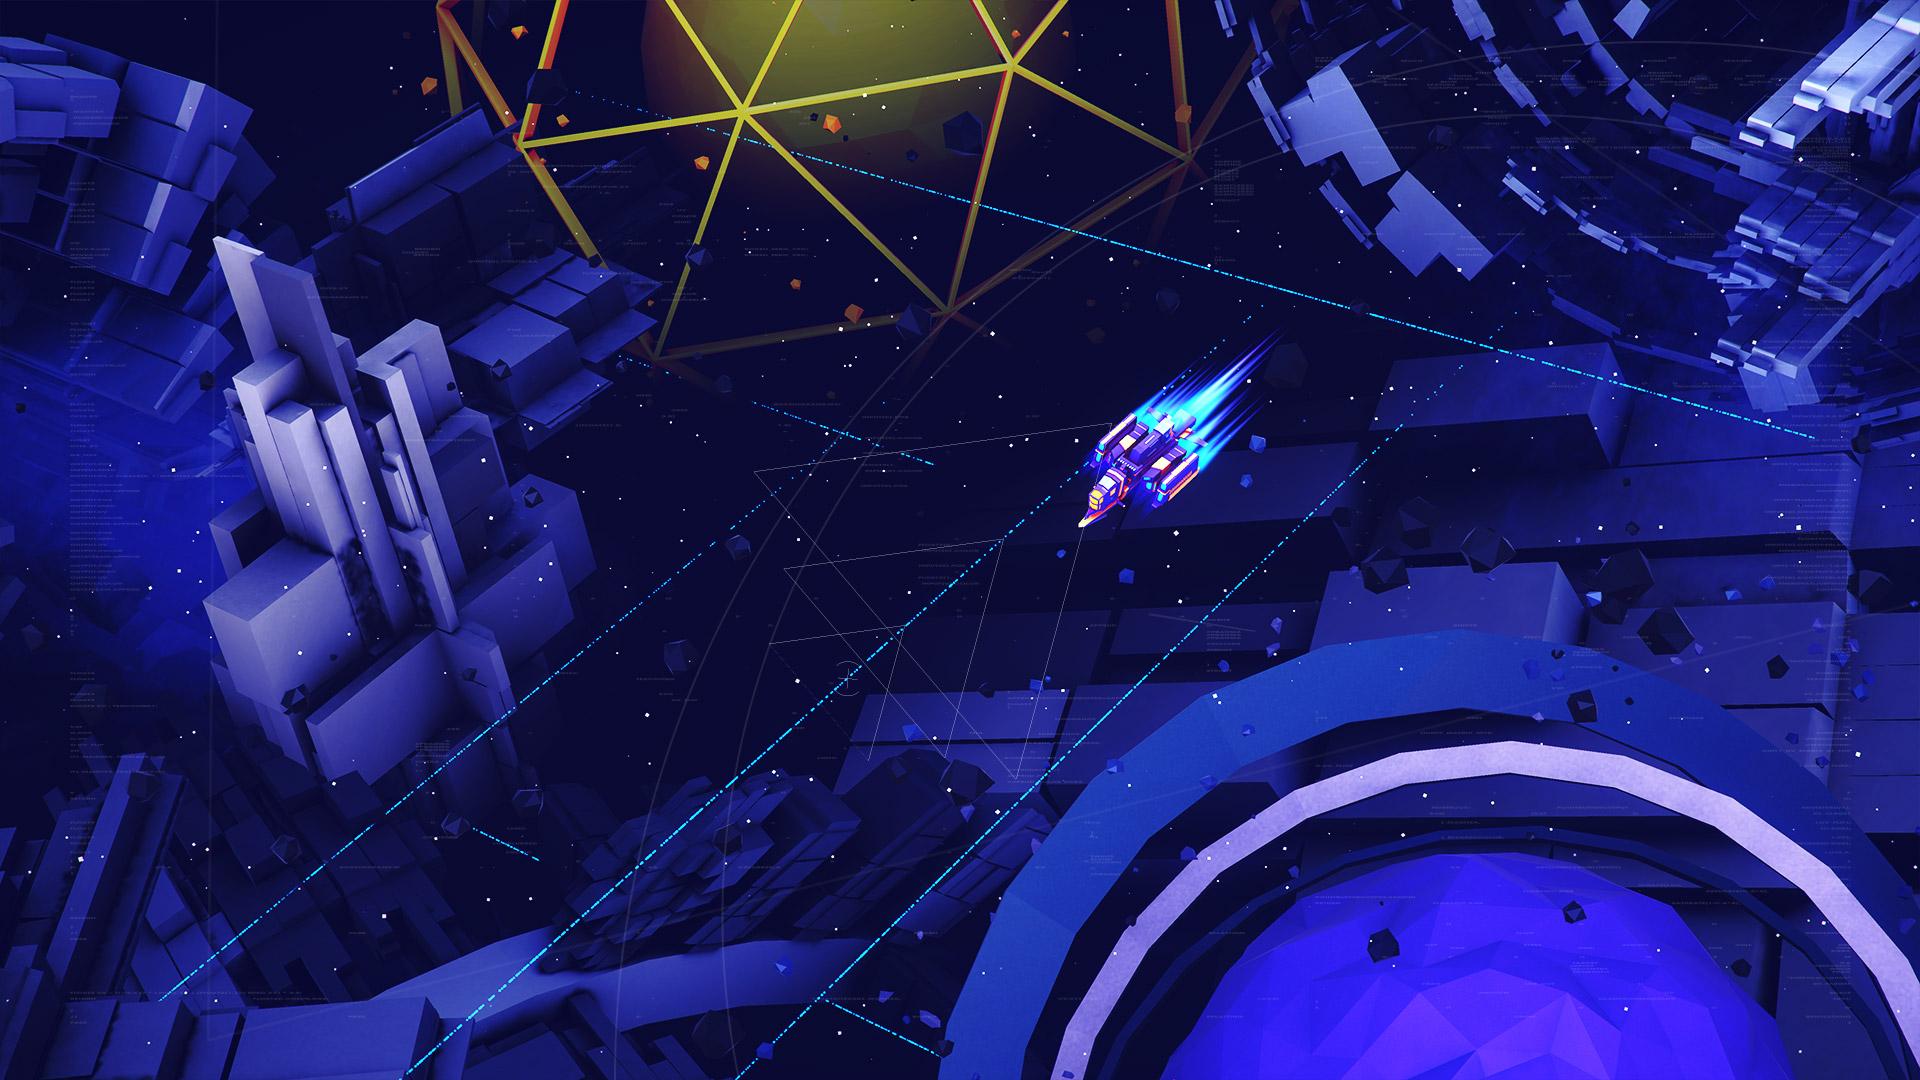 Space_Journey_Unity3D_AssetStore_Dust.jpg